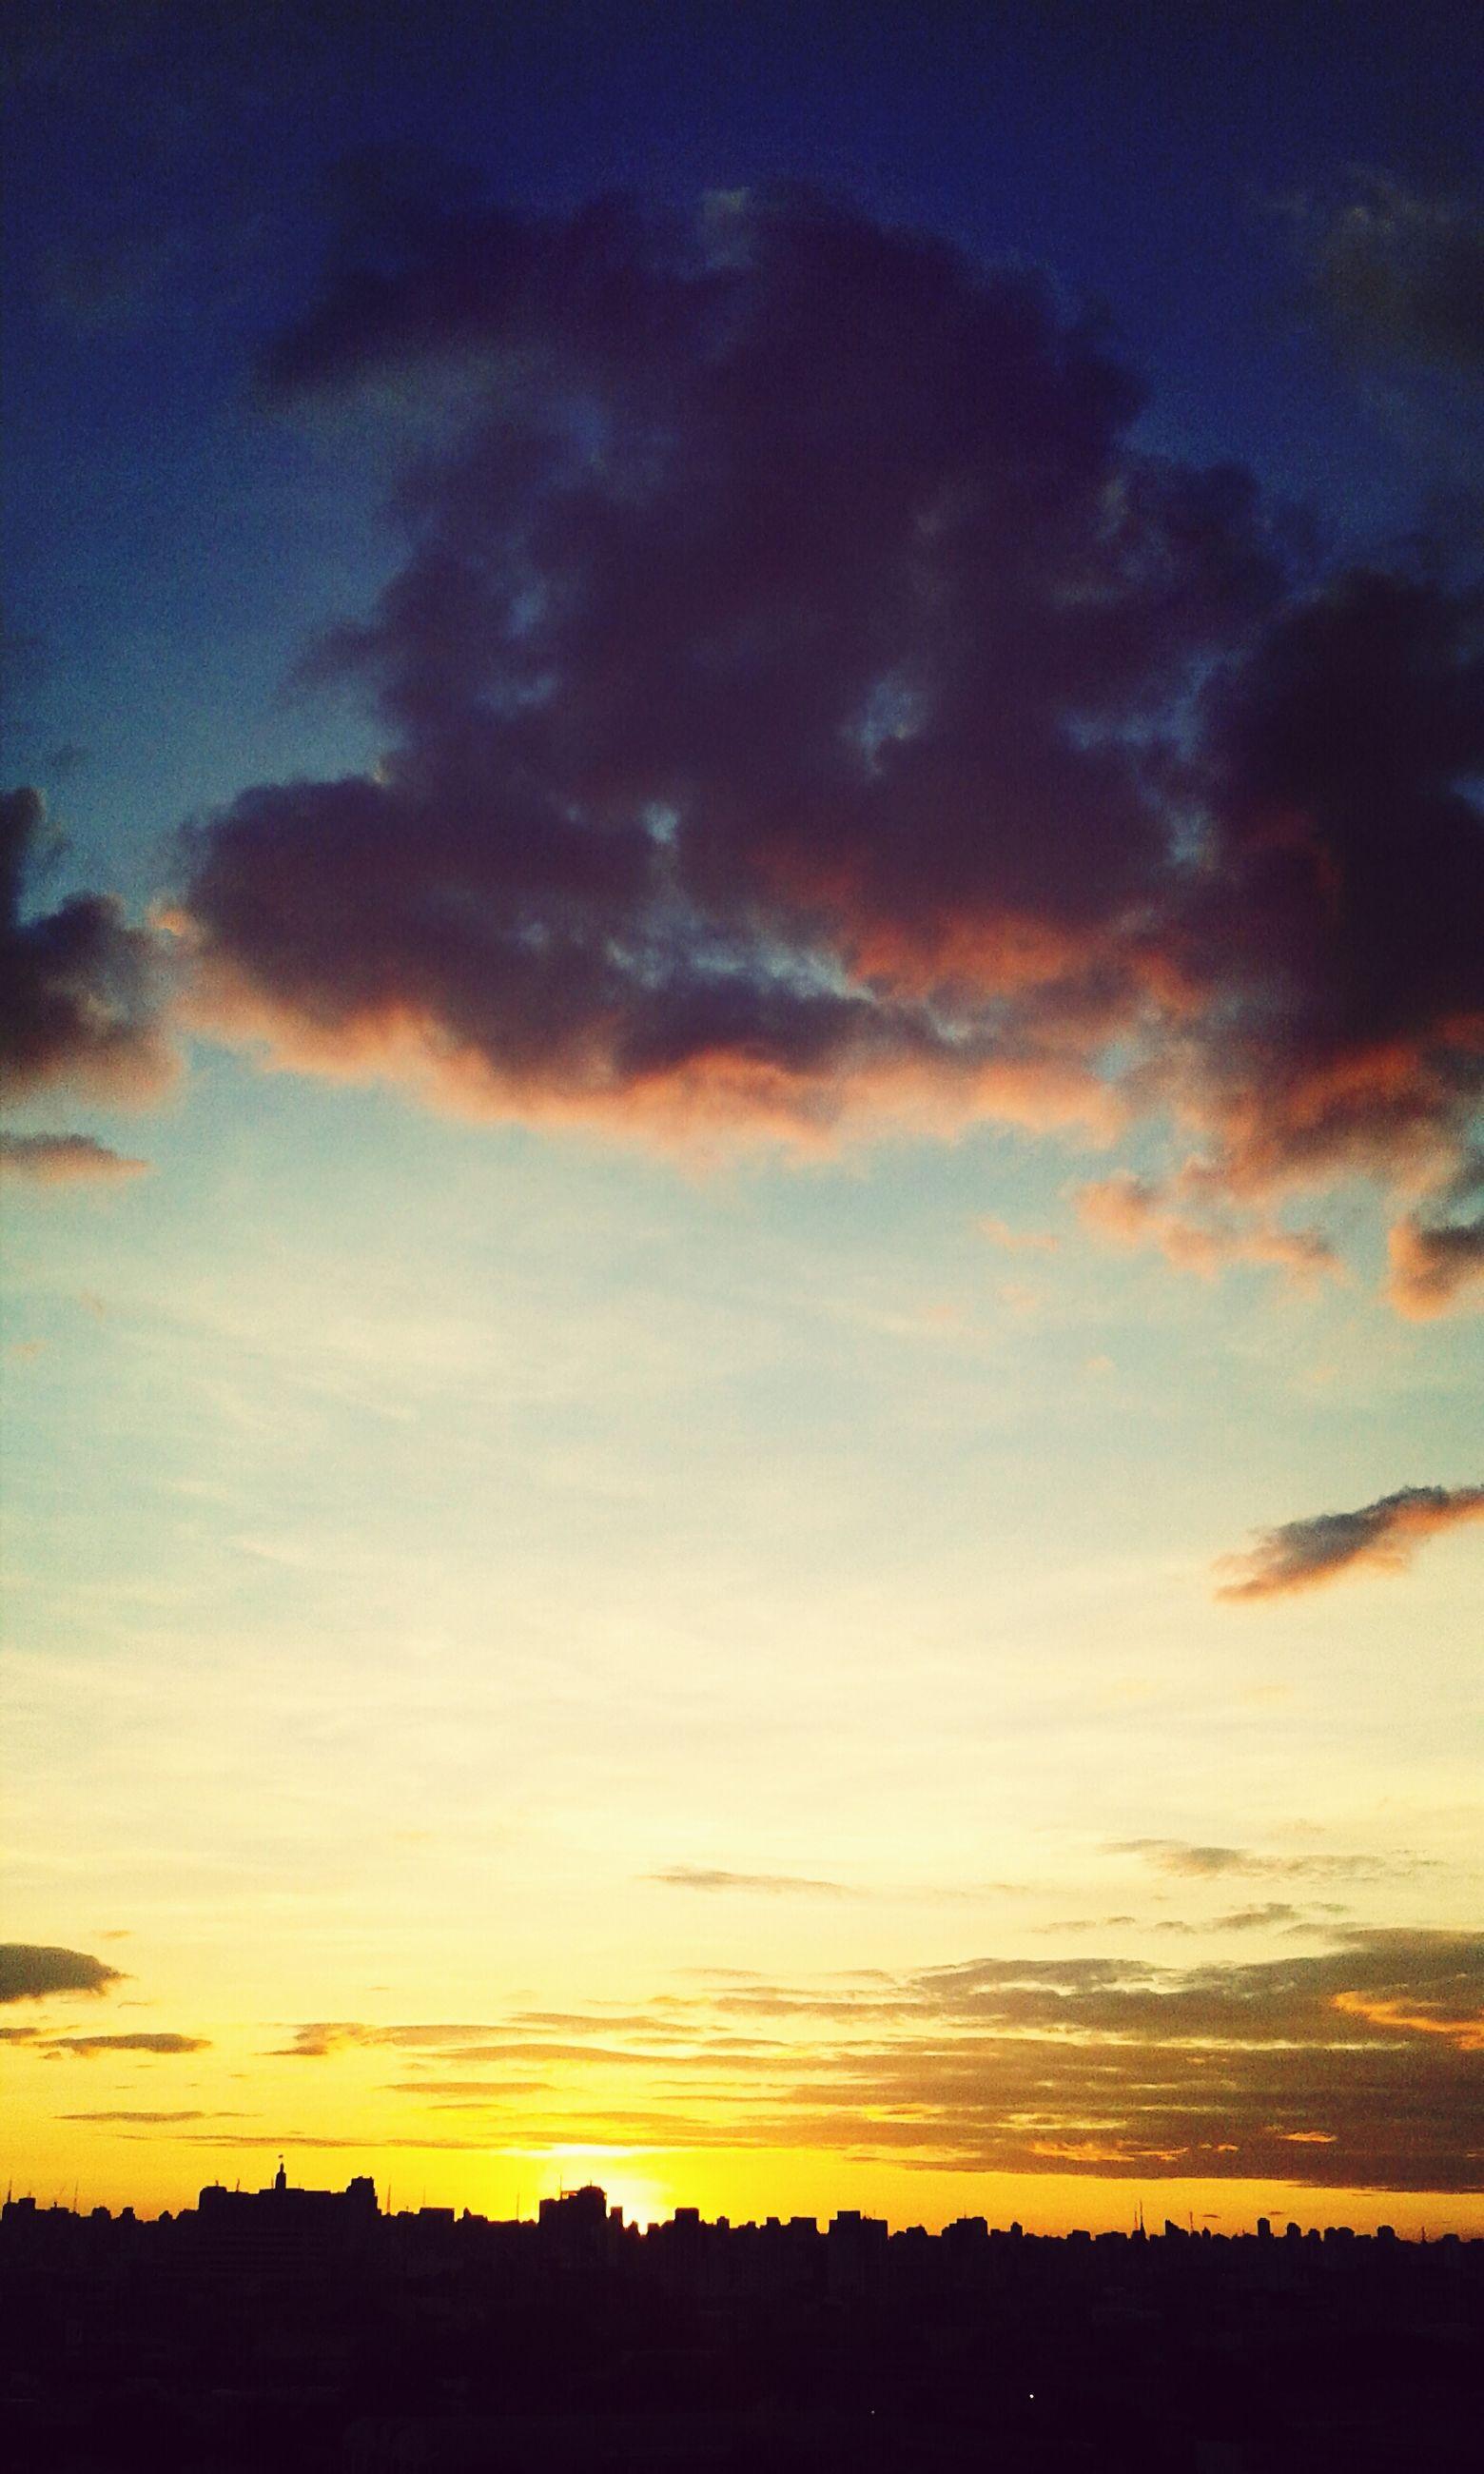 sunset, silhouette, sky, scenics, beauty in nature, tranquil scene, orange color, tranquility, landscape, cloud - sky, dramatic sky, nature, idyllic, cloud, field, moody sky, outdoors, no people, dark, majestic